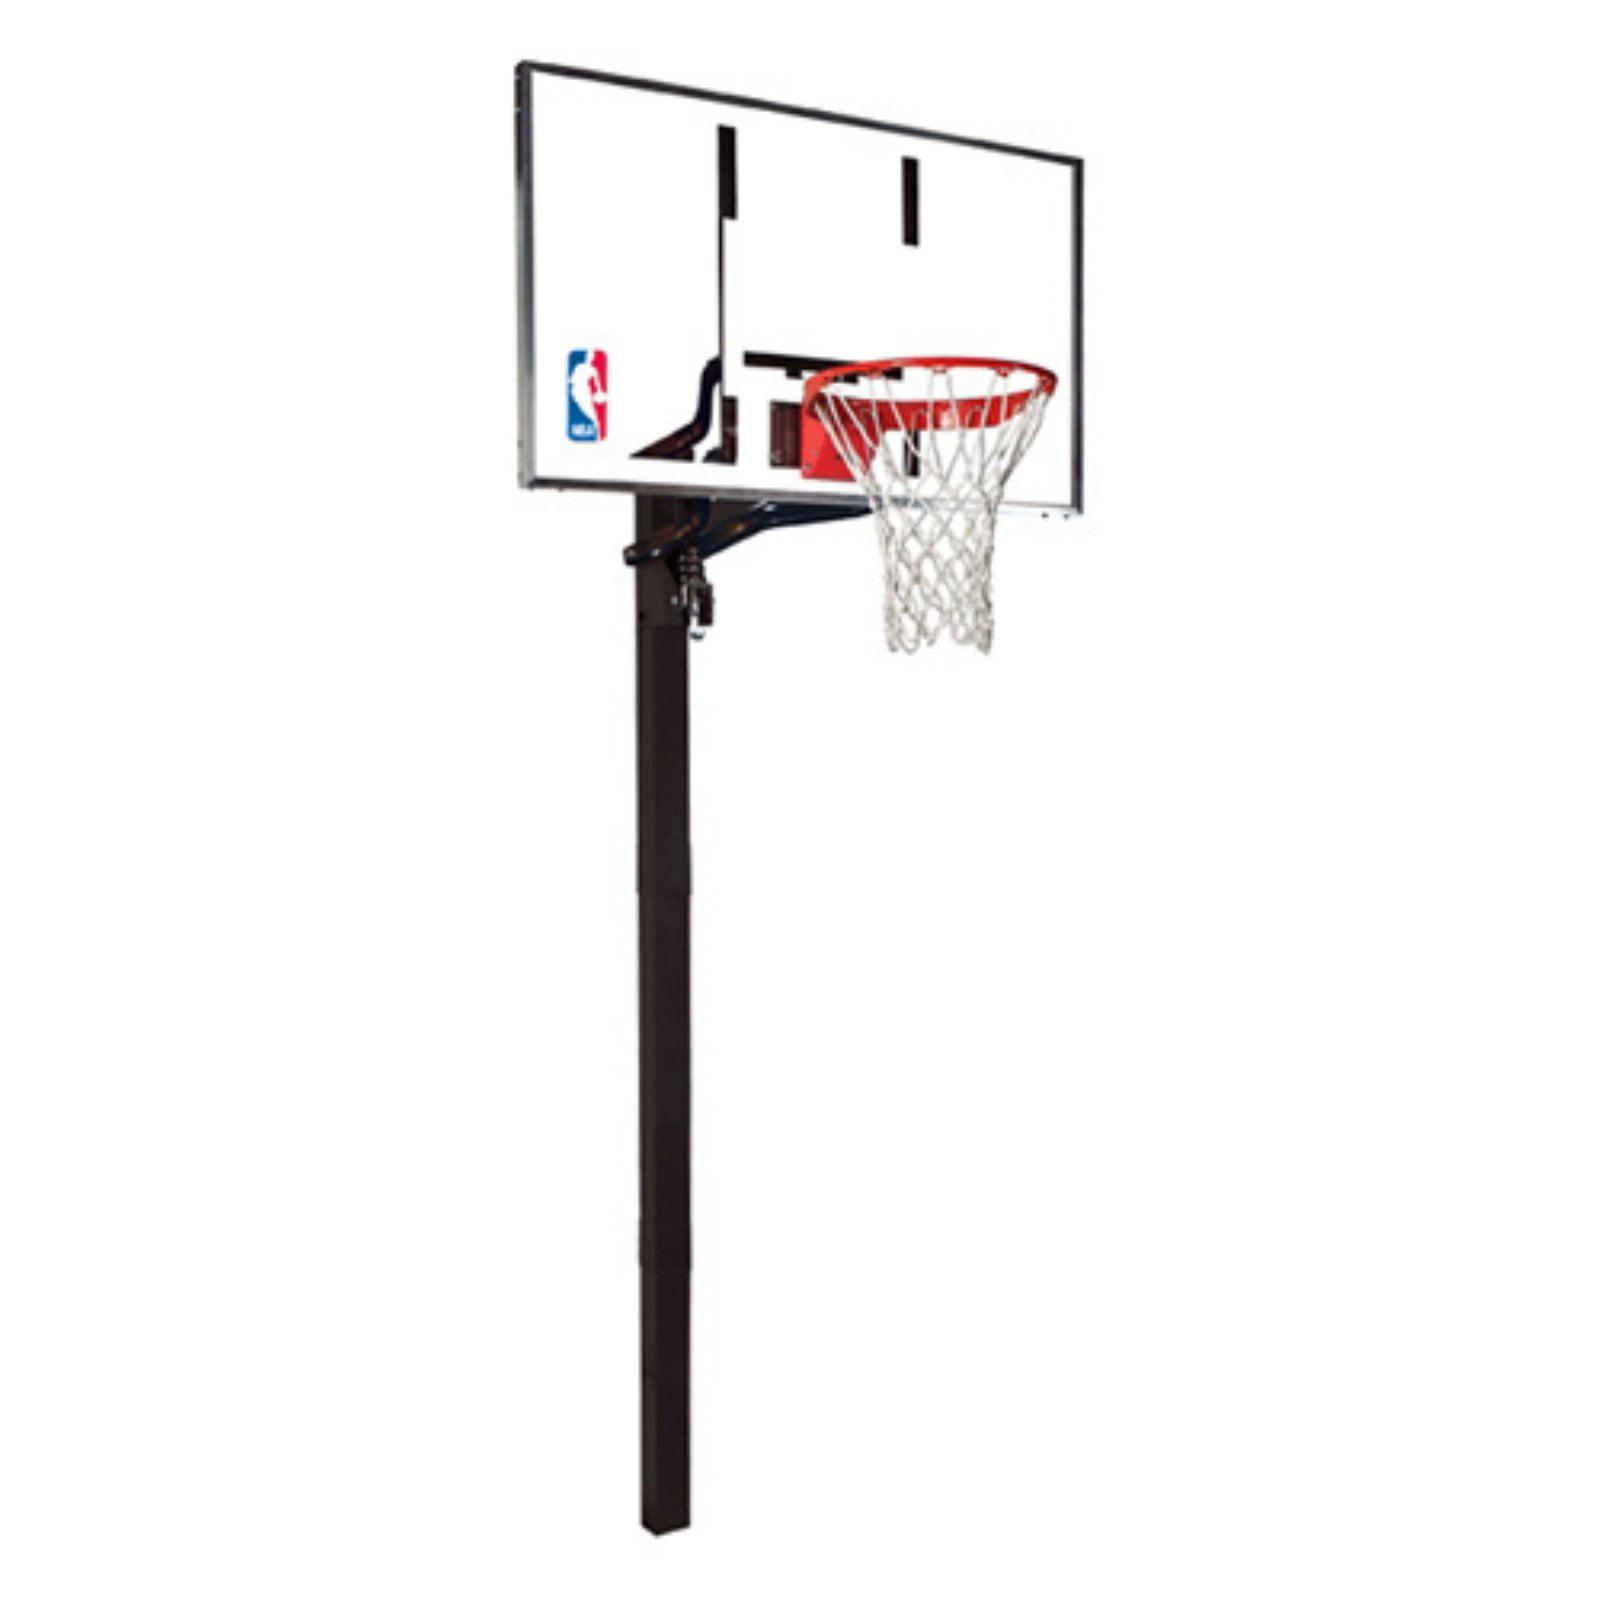 "Spalding NBA 54"" Glass U-Turn In-Ground Hoop System by Spalding"